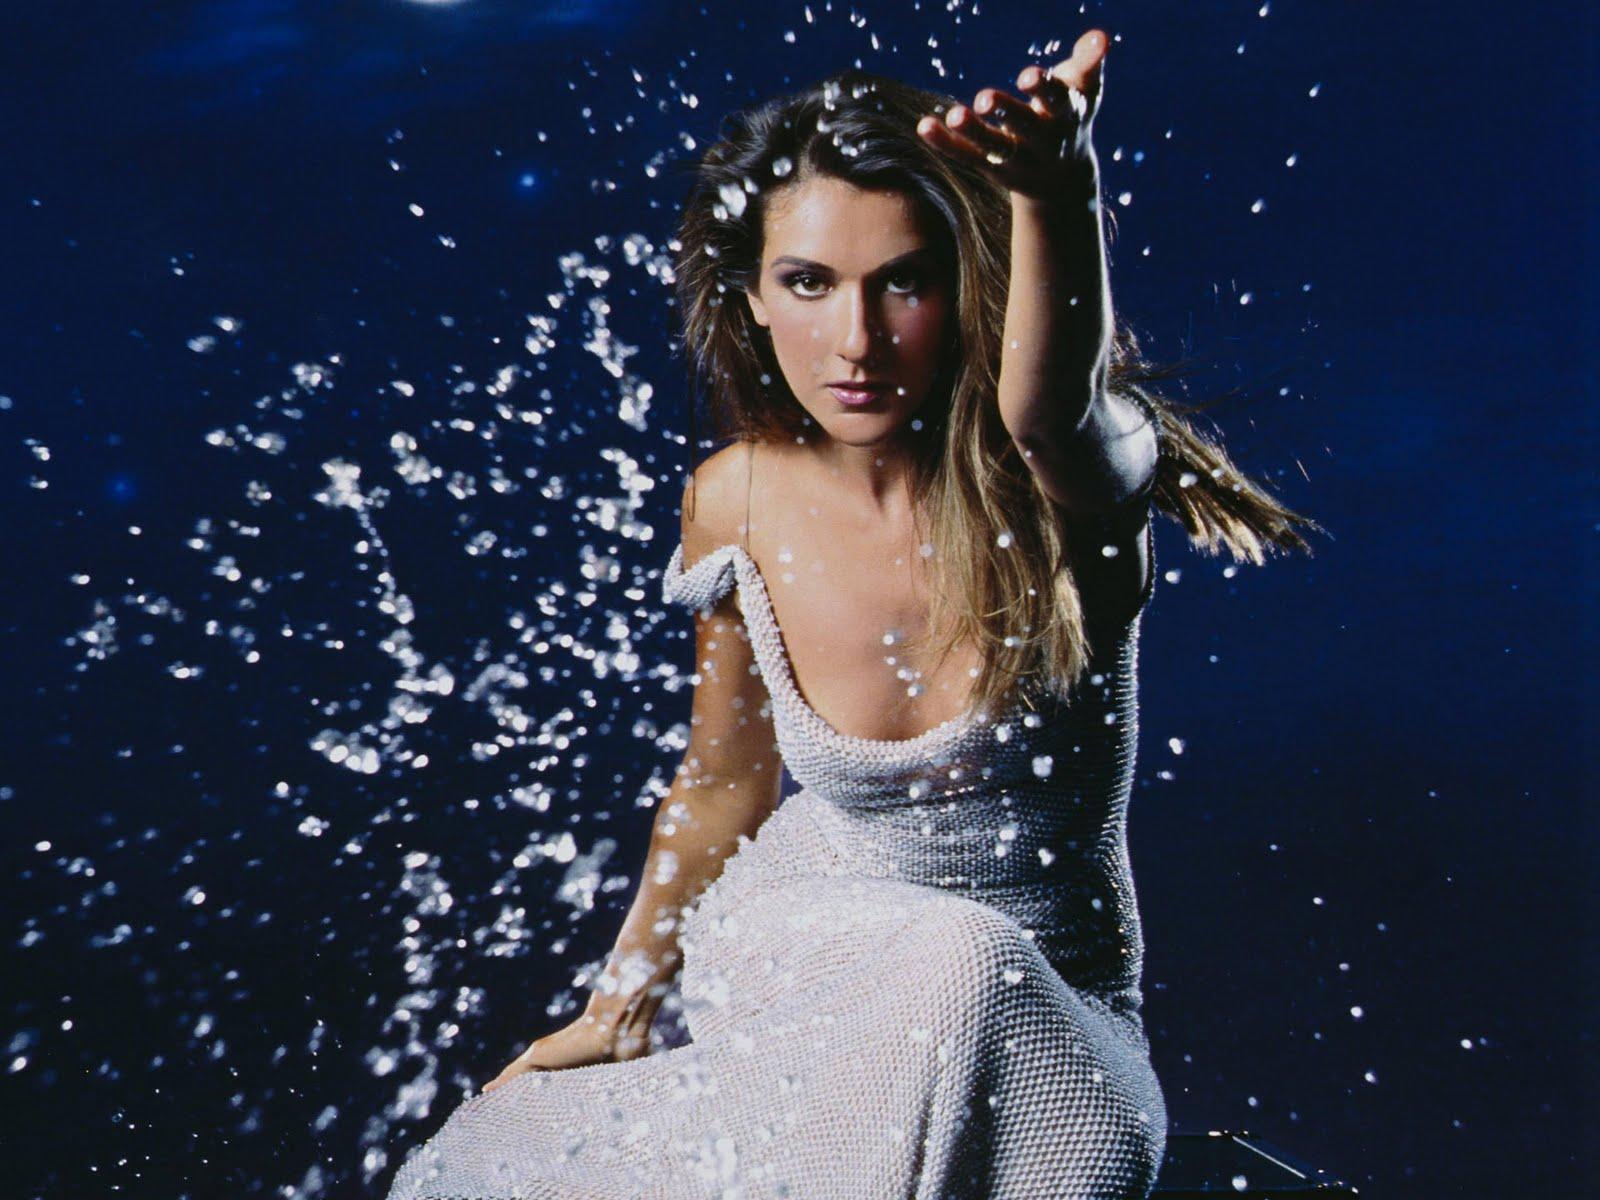 The Power Of Love - Celine Dion: Celine Dion : Ladies